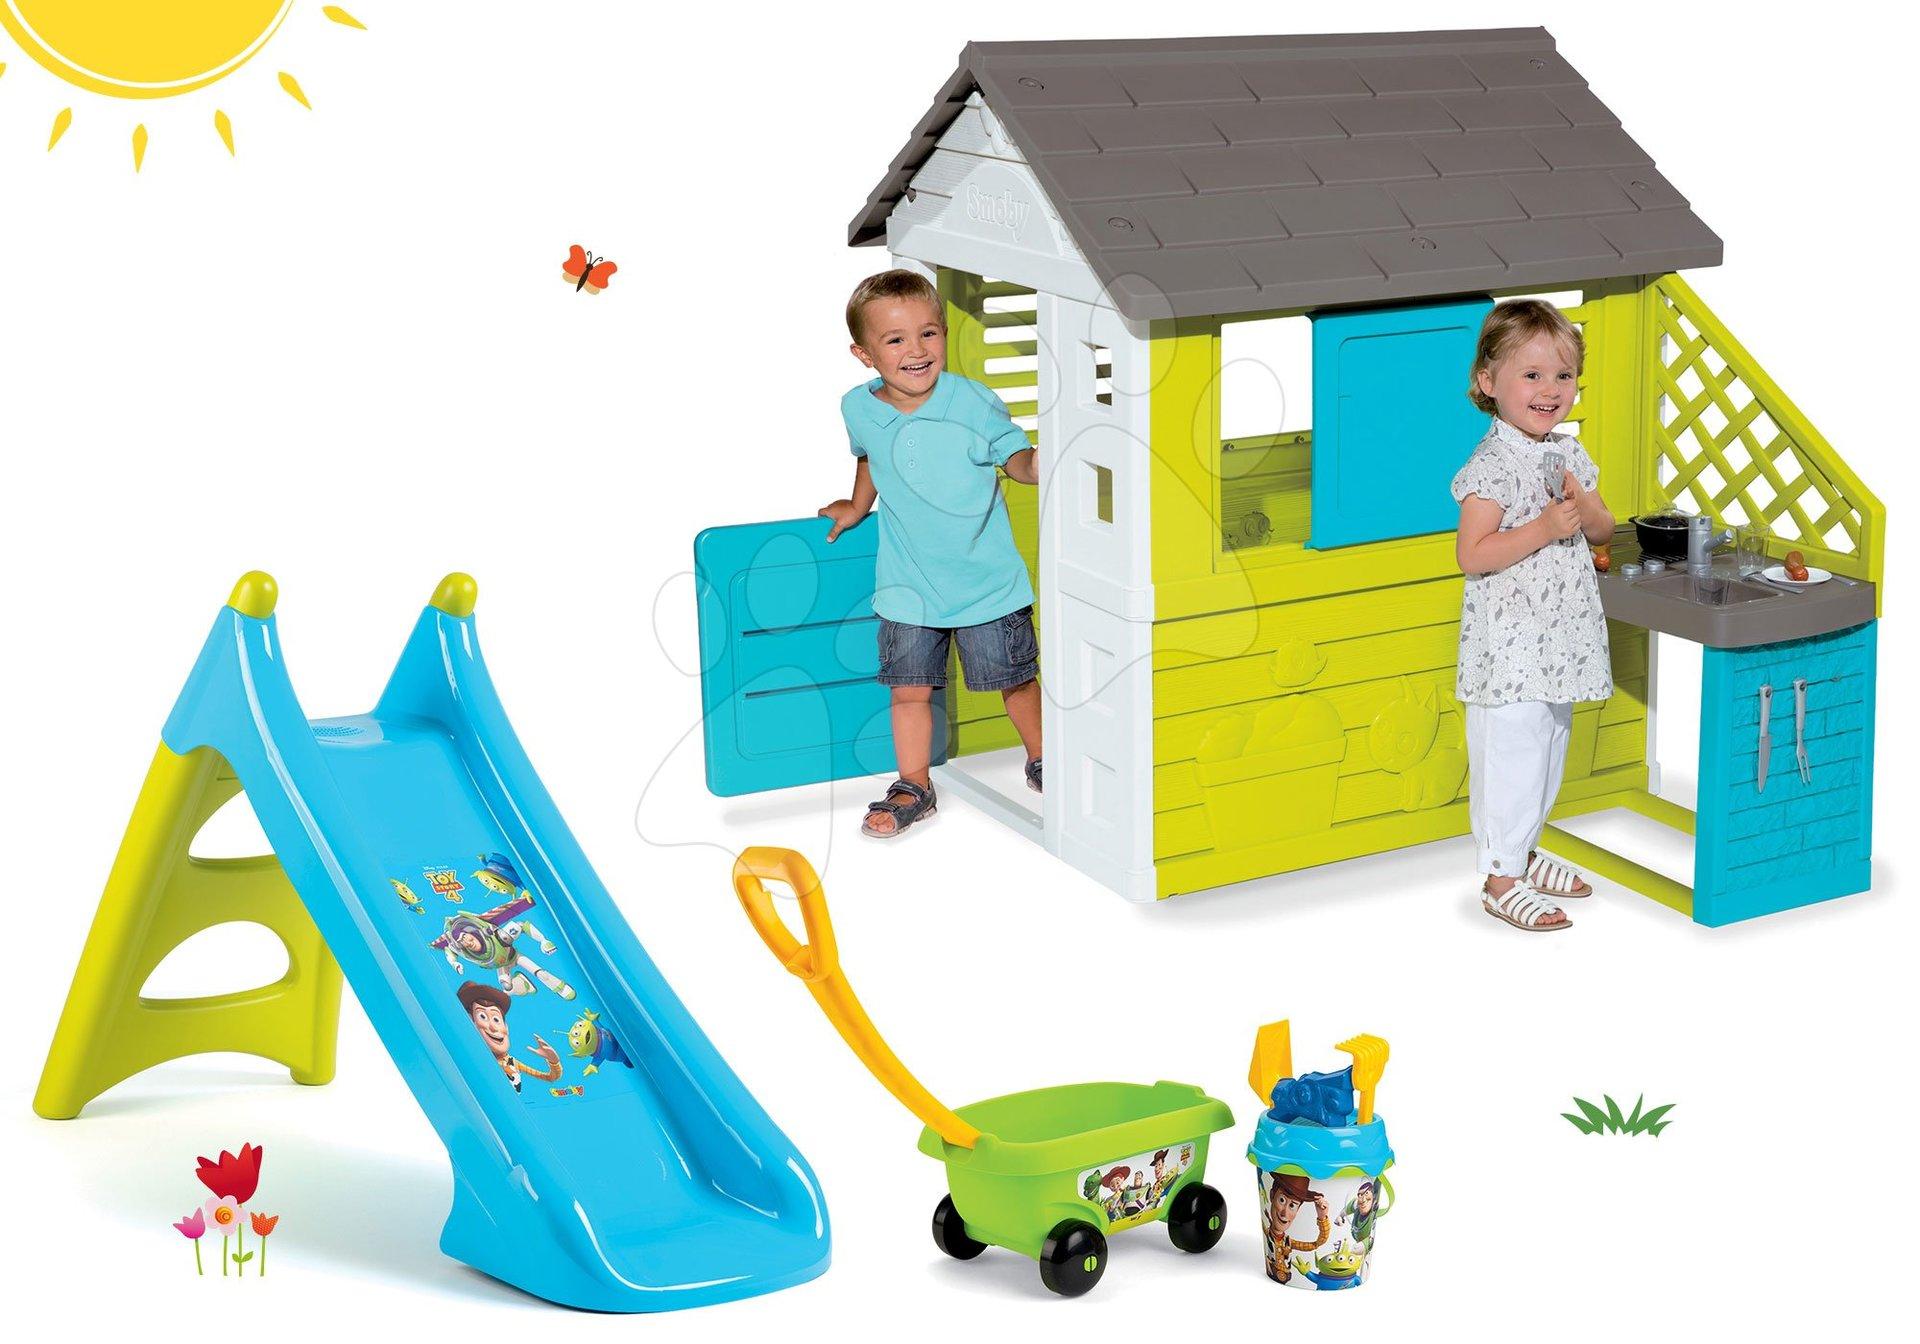 Domčeky so šmykľavkou - Set domček Pretty Blue Smoby s letnou kuchynkou a šmykľavka Toy Story Toboggan XS s vozíkom od 24 mes